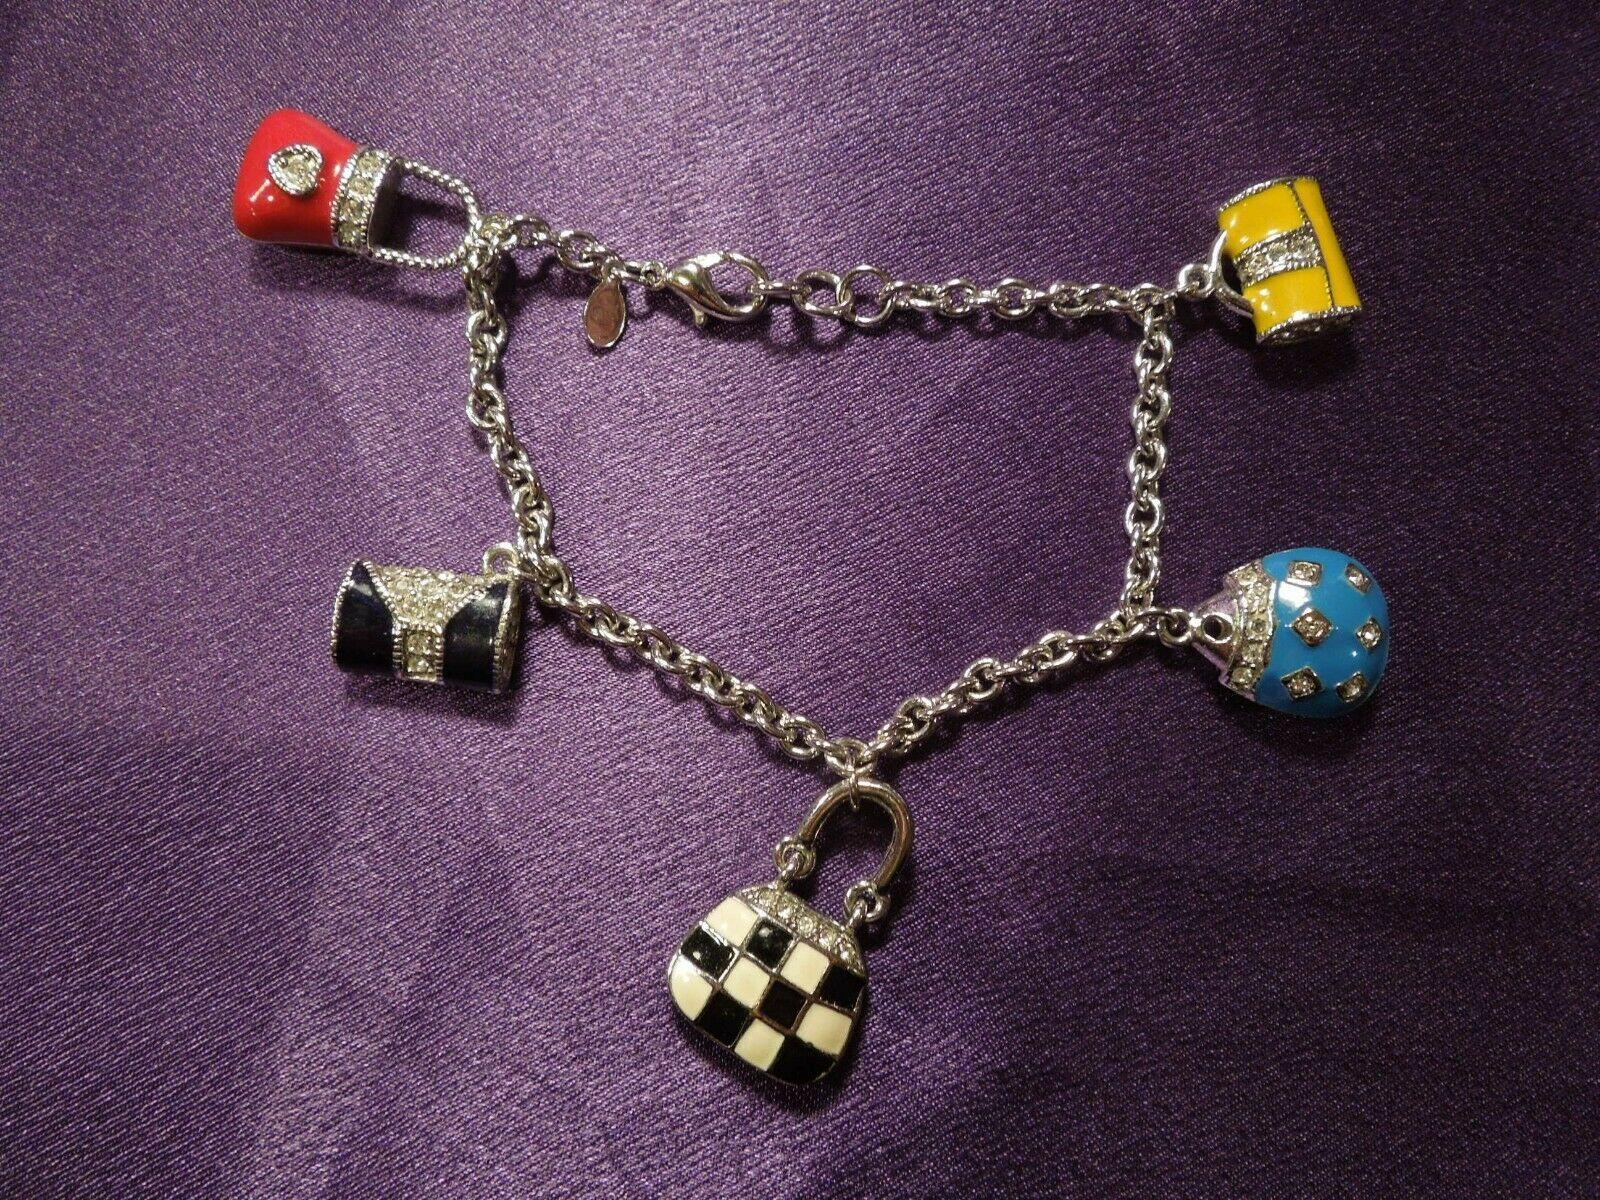 SILVER ITALIAN CHARM LITTLE BROTHER  fits all design 9mm bracelet SK8